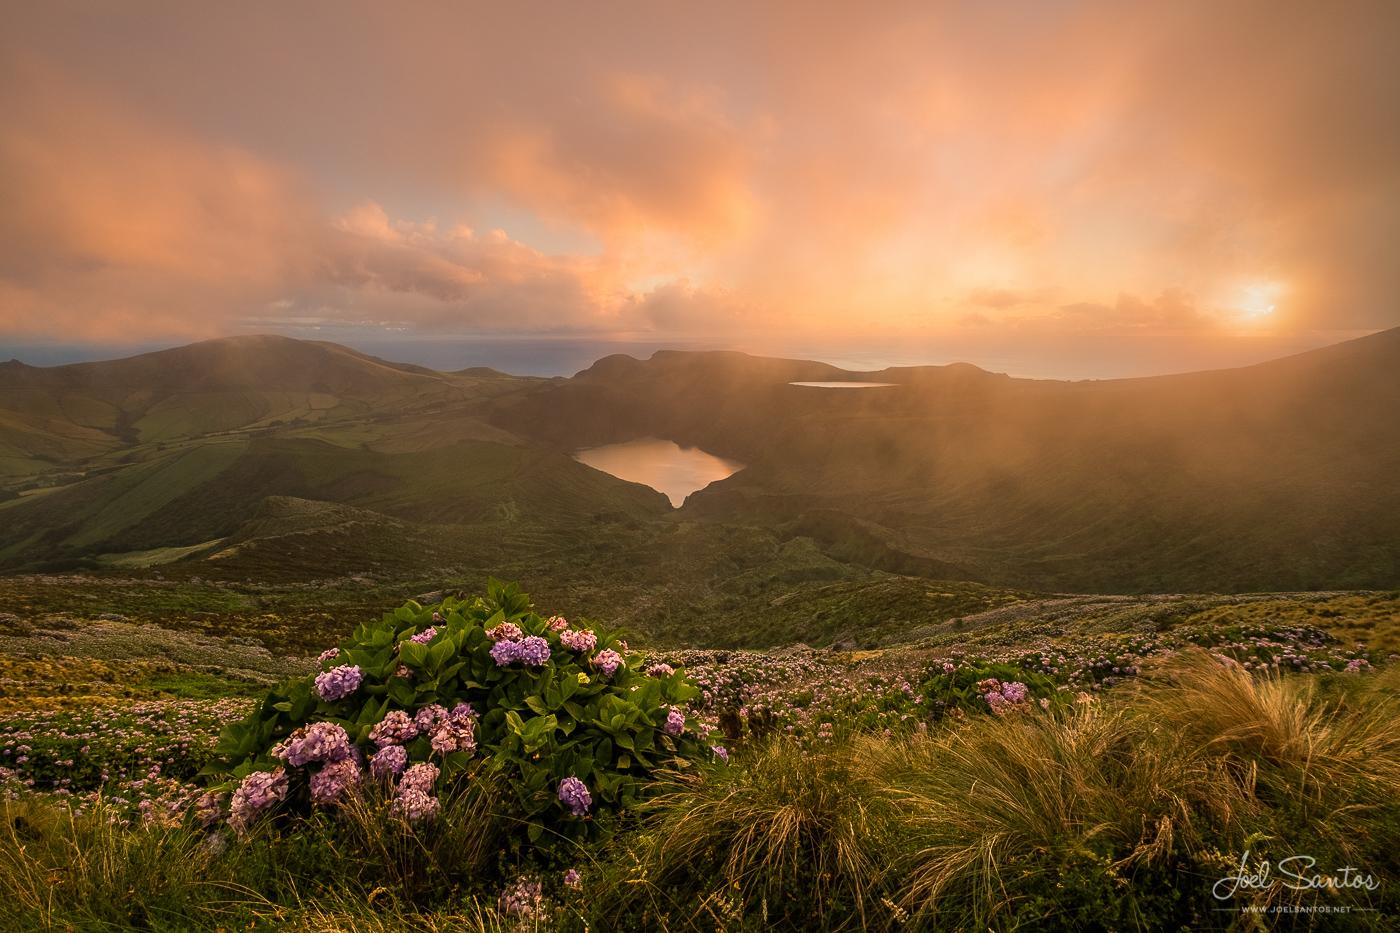 Caldeiras Rasa e Funda - Ilha das Flores - Joel Santos